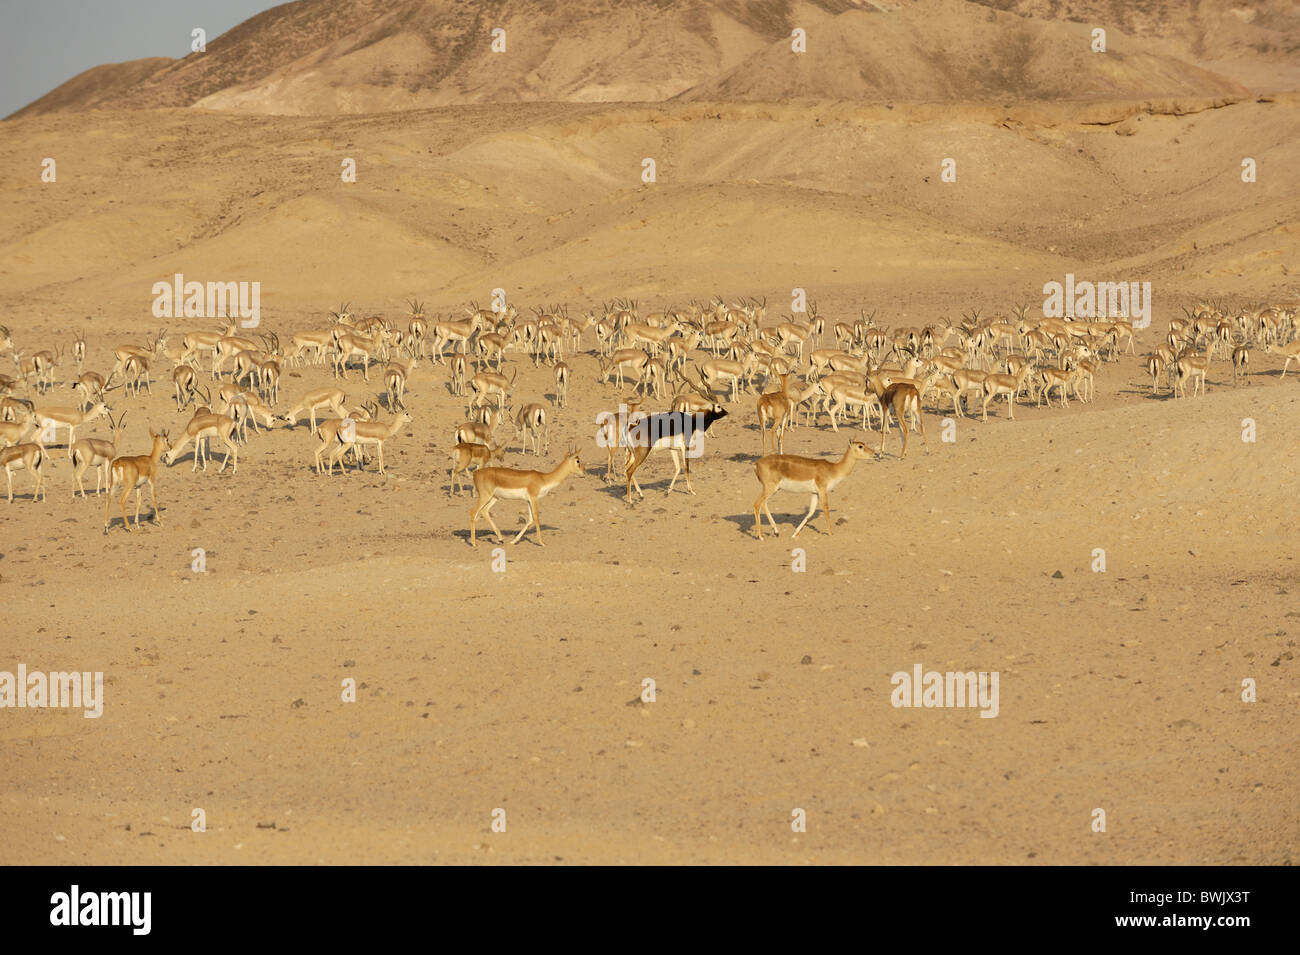 Herd of blackbuck (Antilope cervicapra) on Sir Bani Yas Island Wildlife Reserve, Abu Dhabi - Stock Image